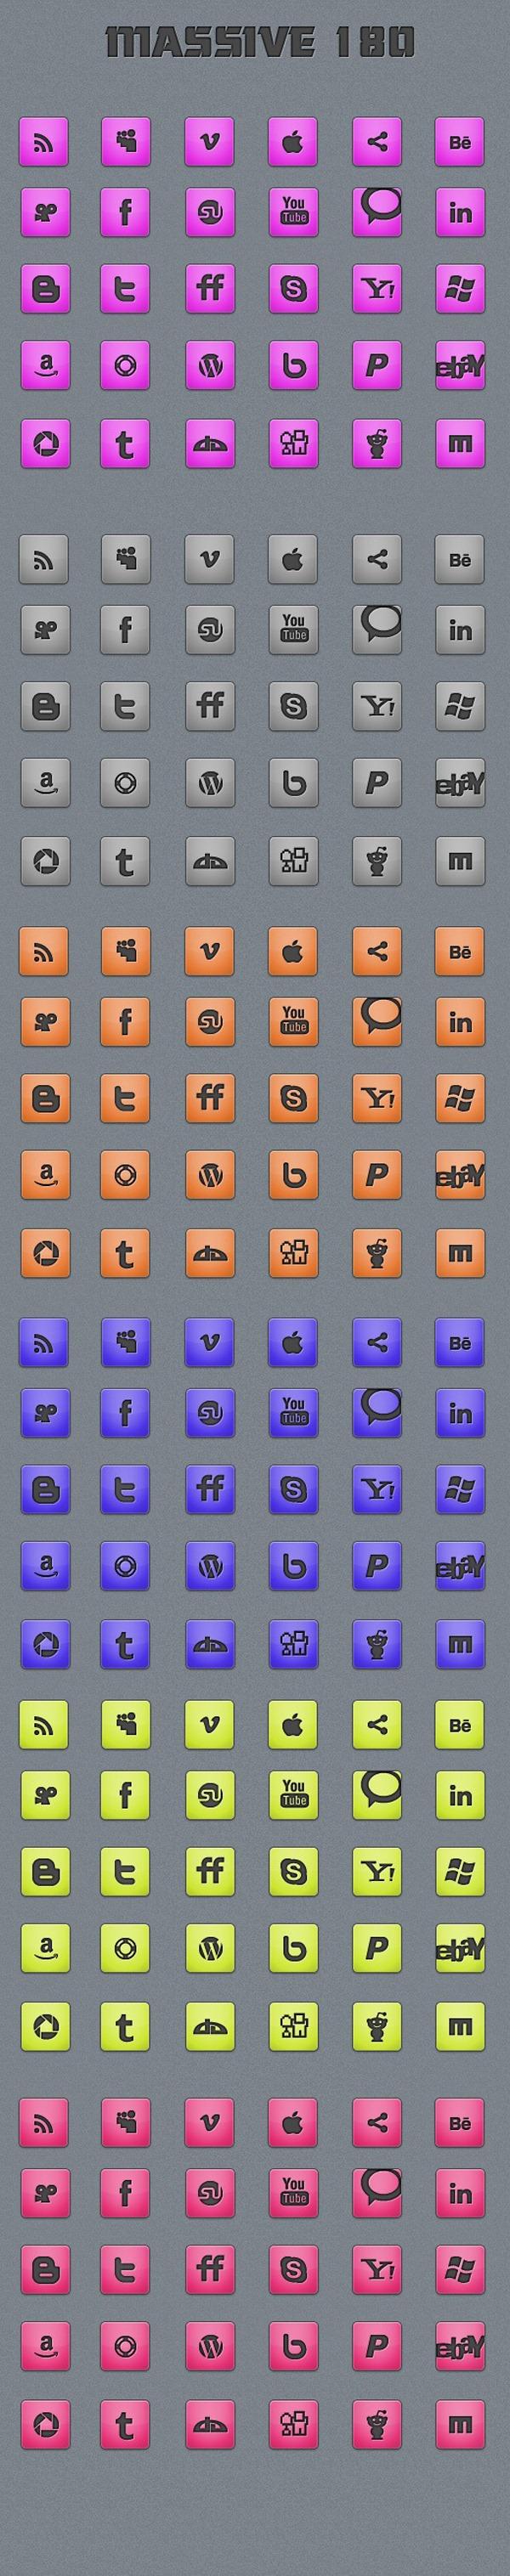 180-Massive-Minimalistic-Icon-set